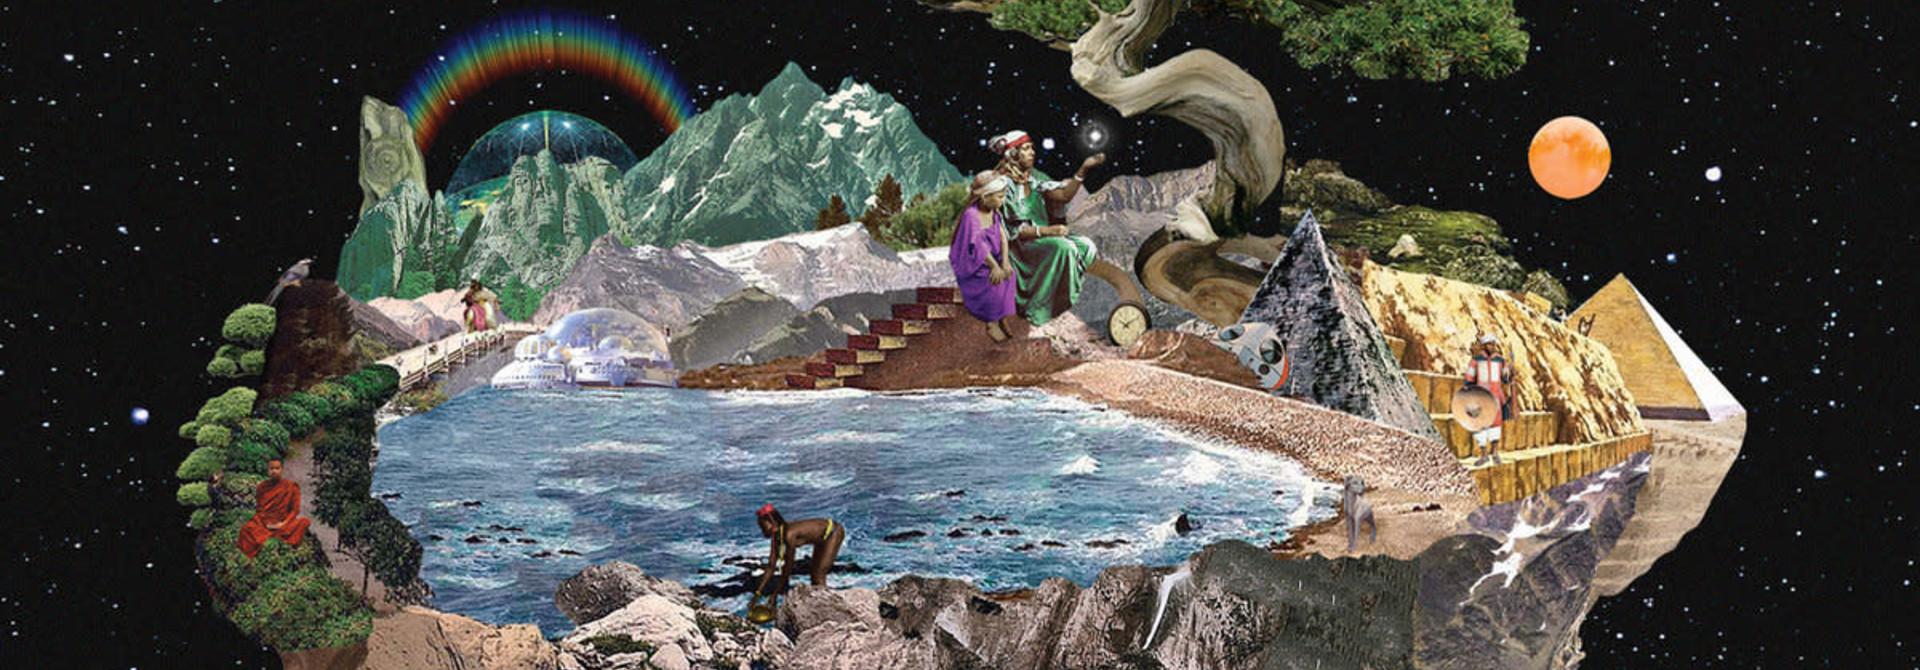 Antibalas • Where The Gods Are In Peace